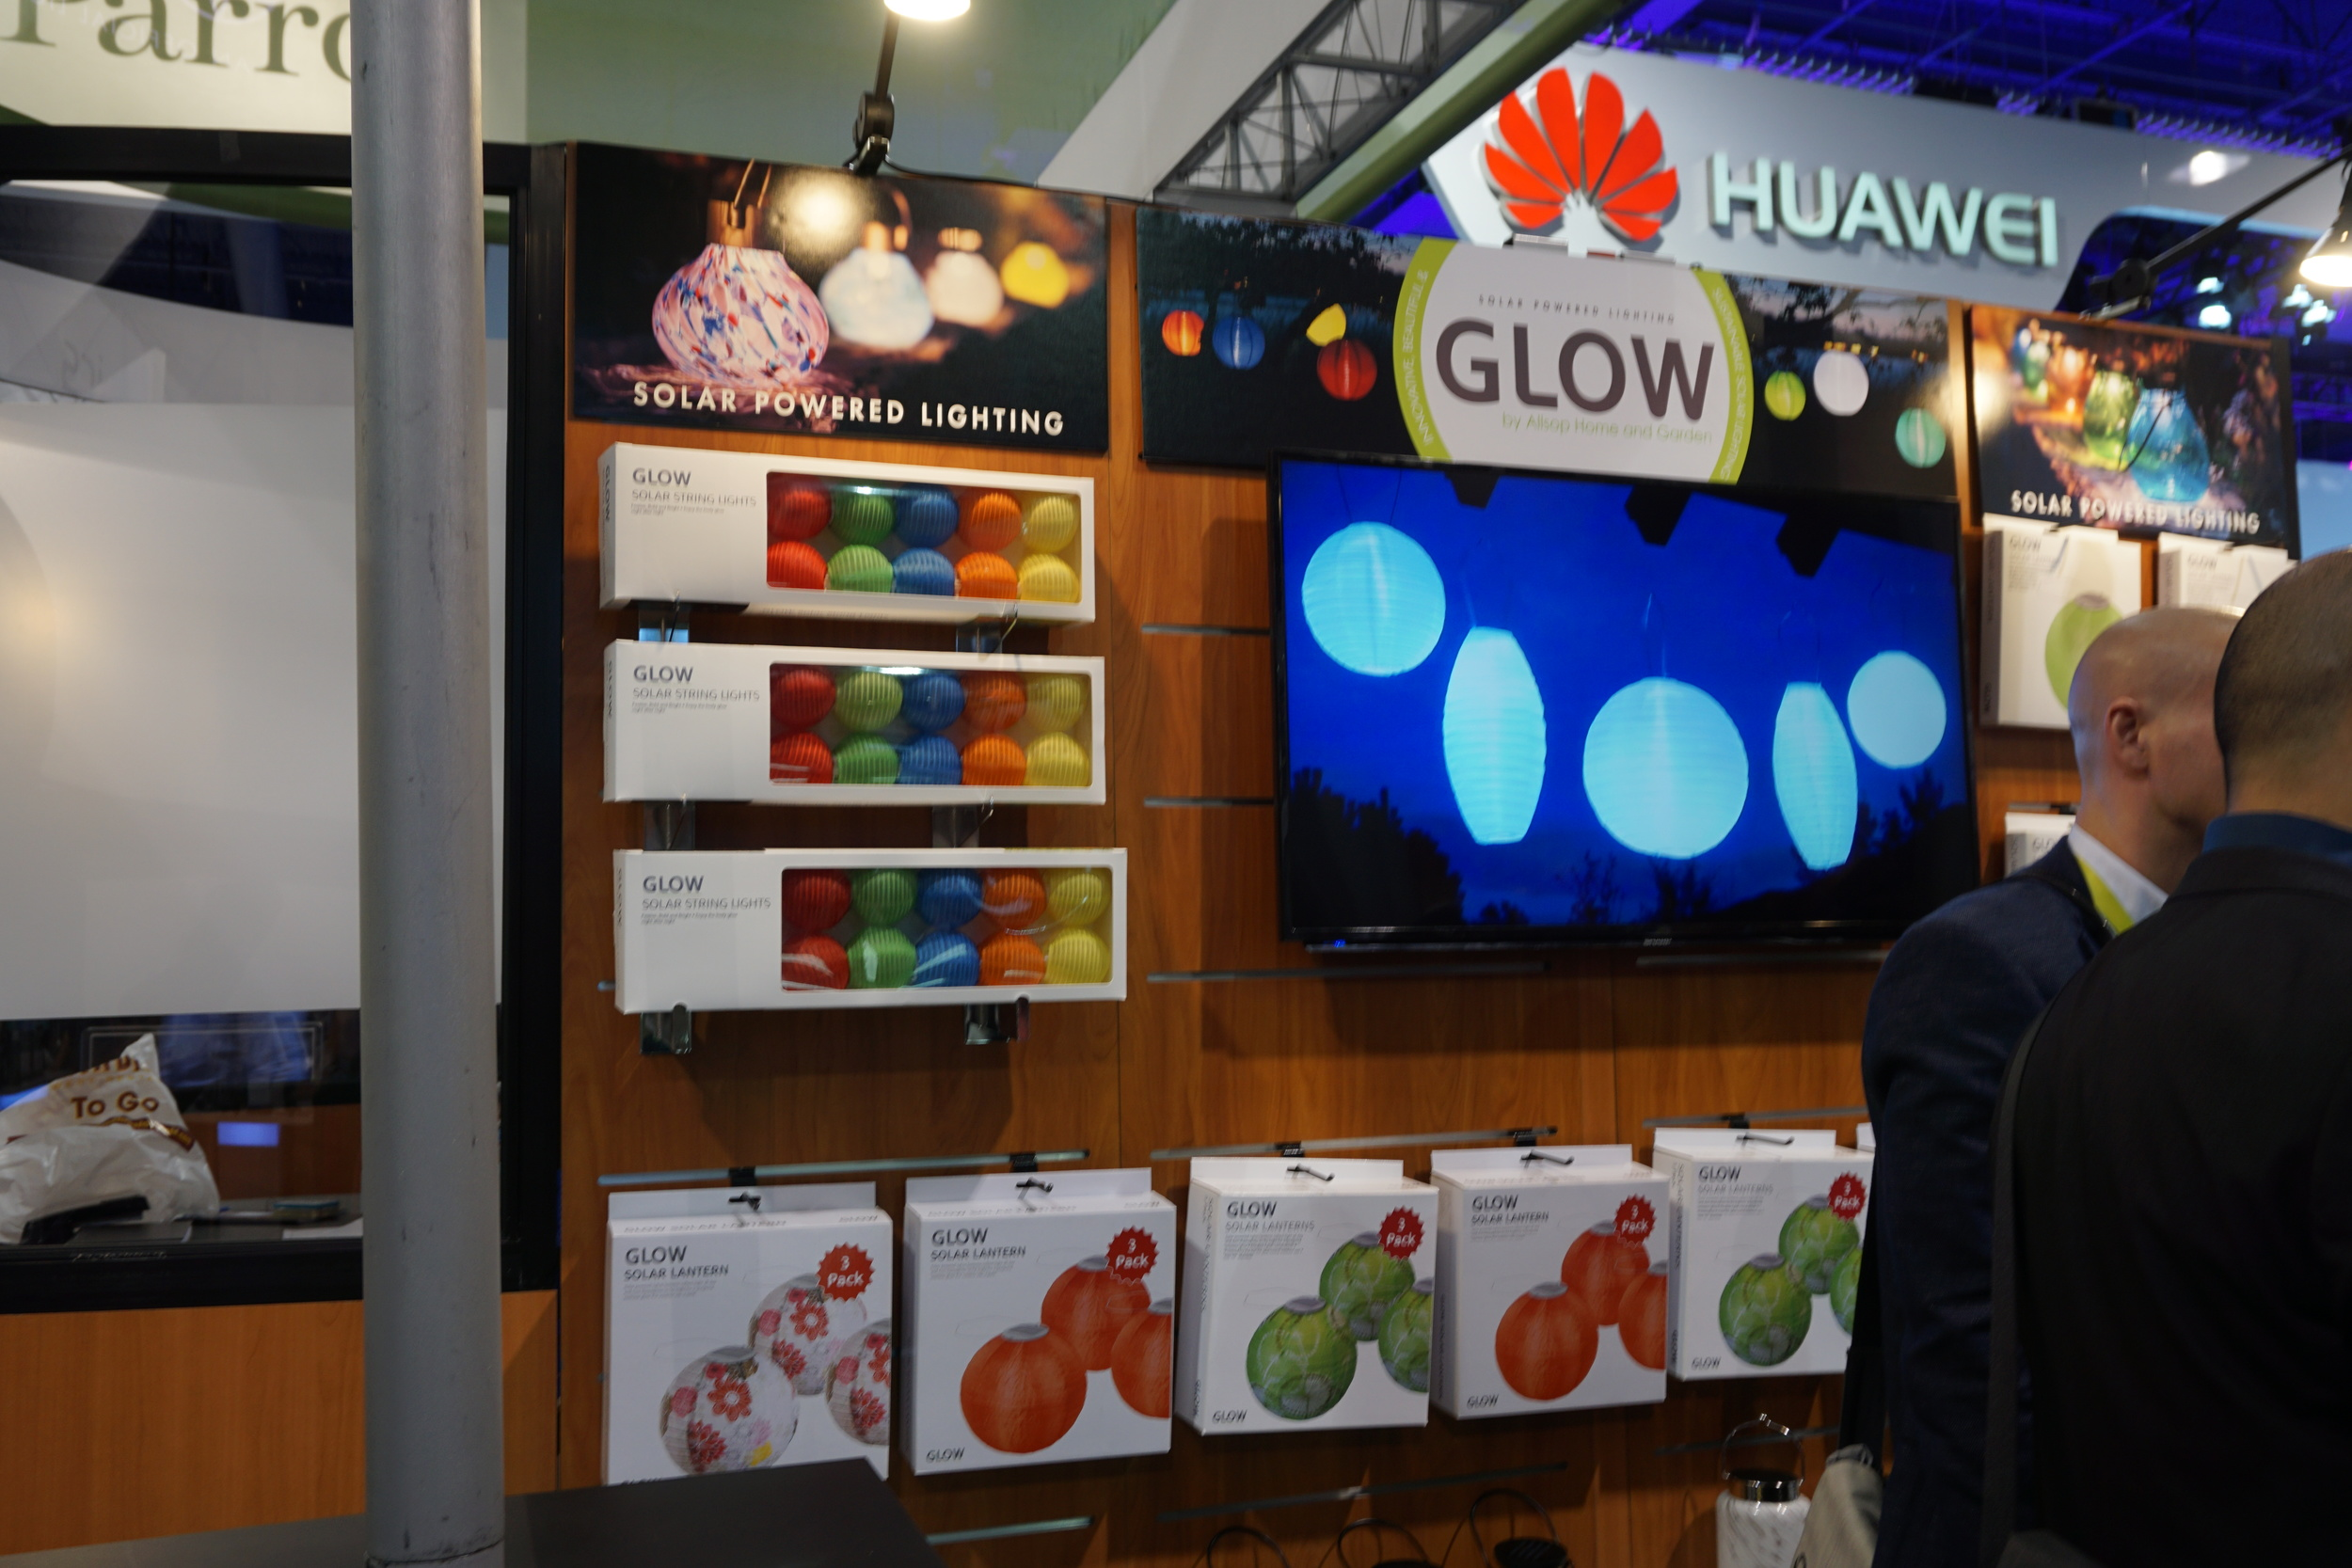 Glow Solar Powered Lighting.JPG